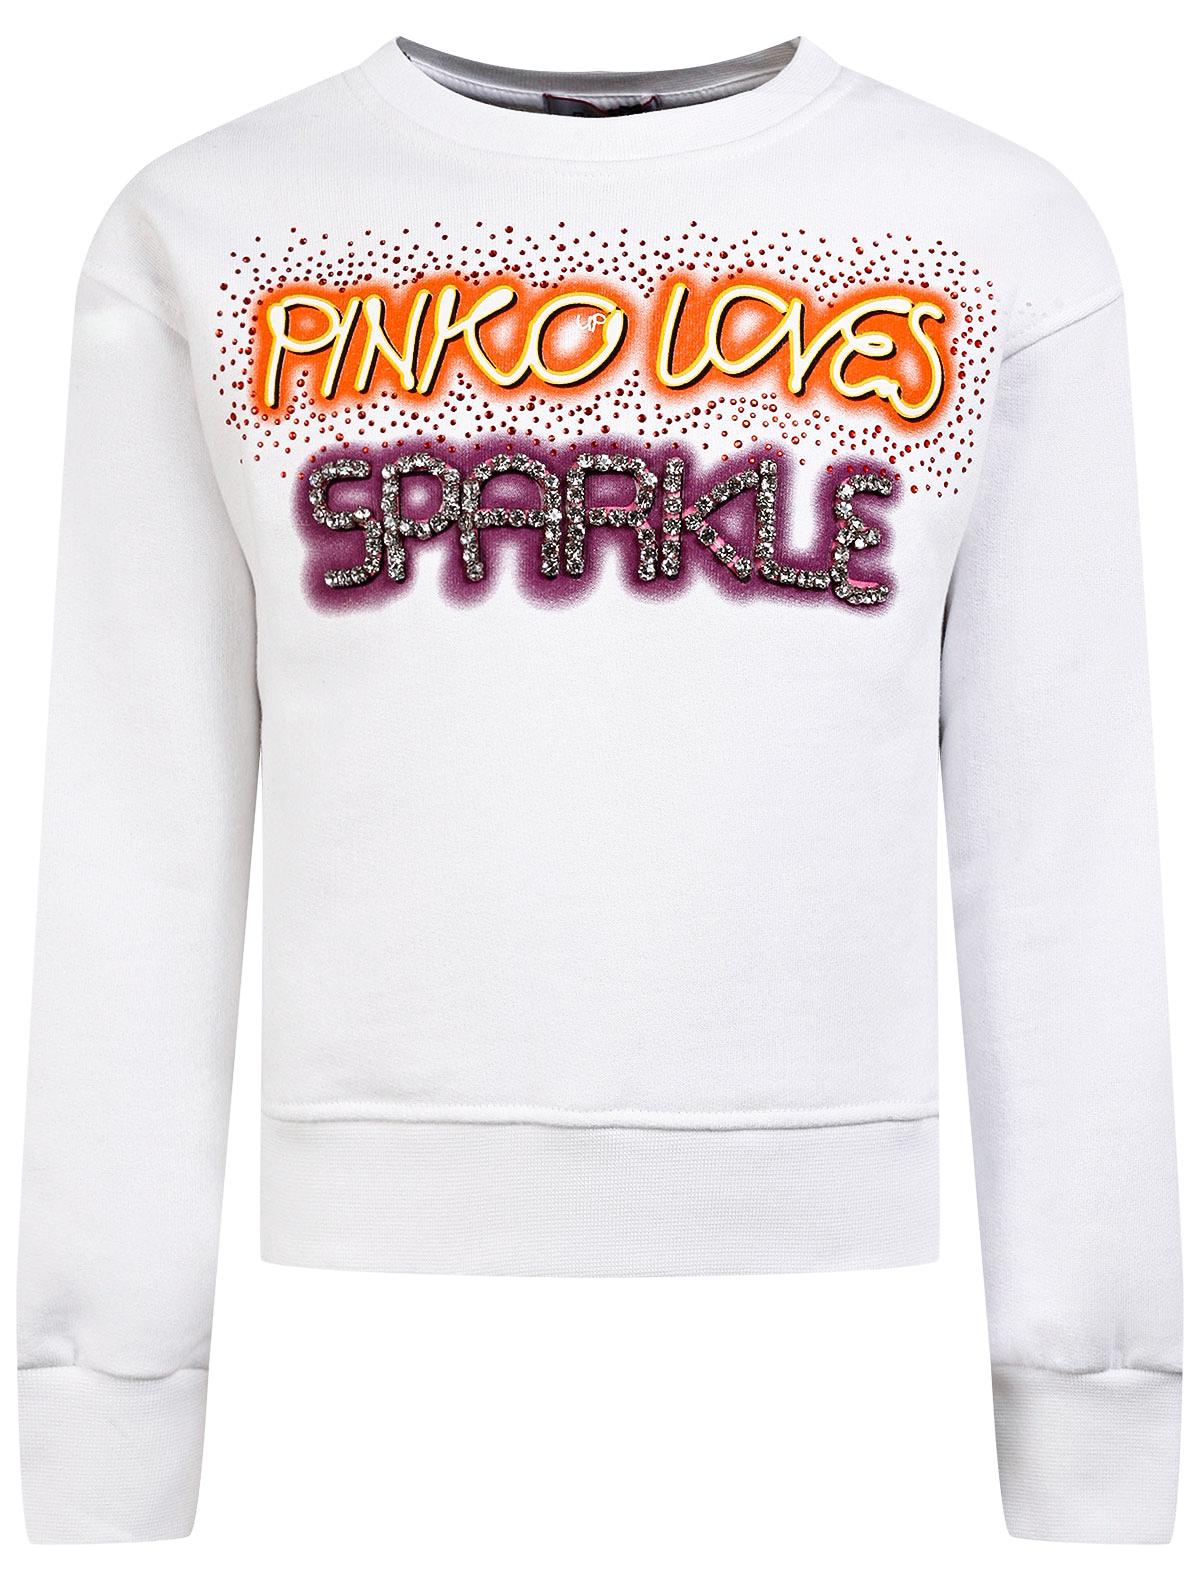 Купить 2276473, Свитшот Pinko Up, белый, Женский, 0084509170990